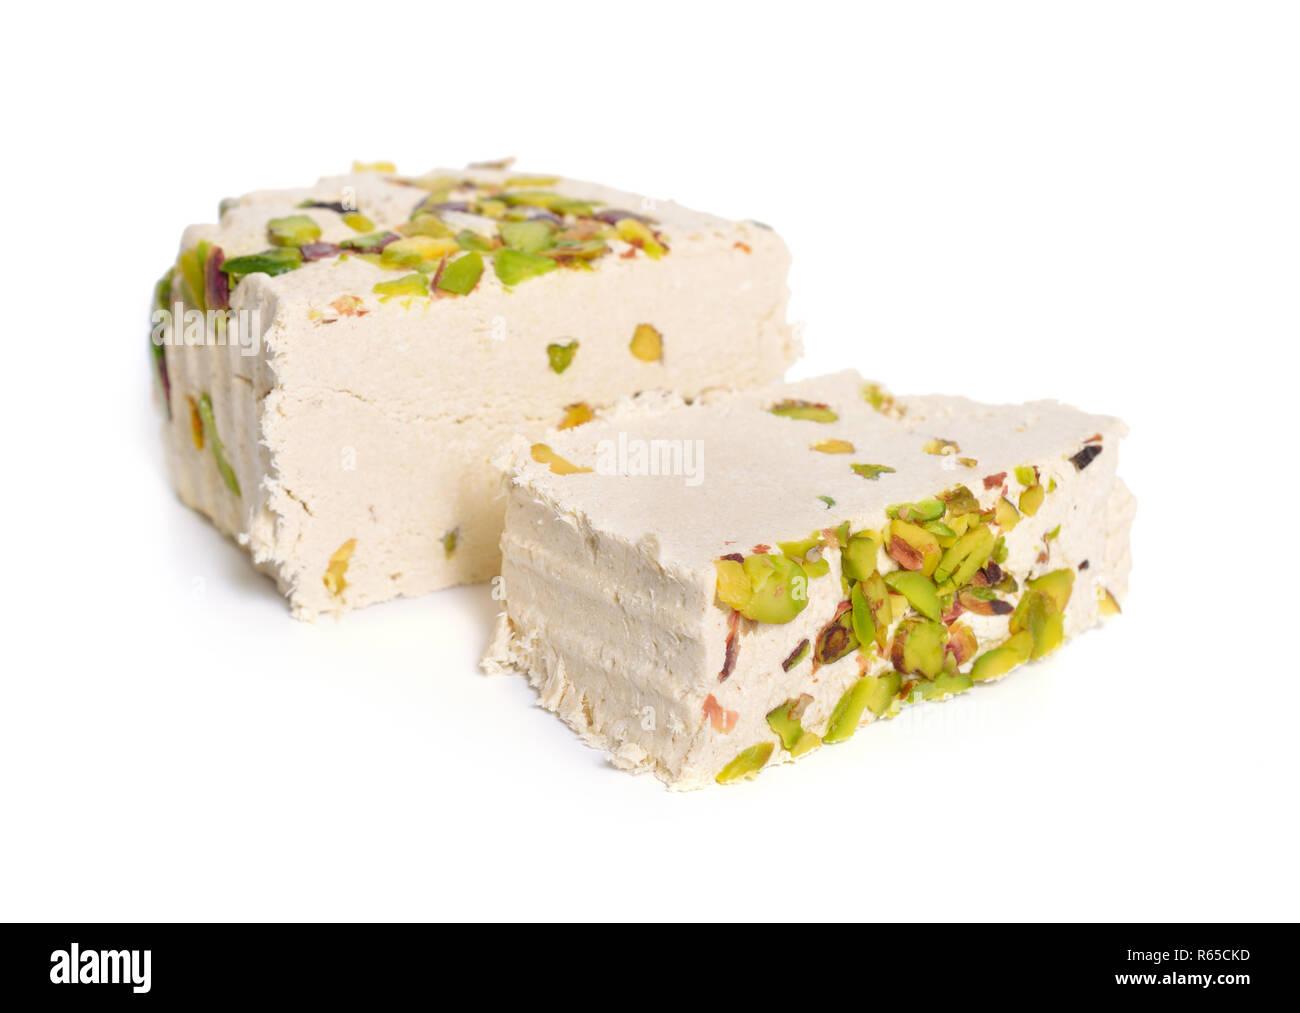 Tahini-based halva with pistachios. Isolated on white background. - Stock Image